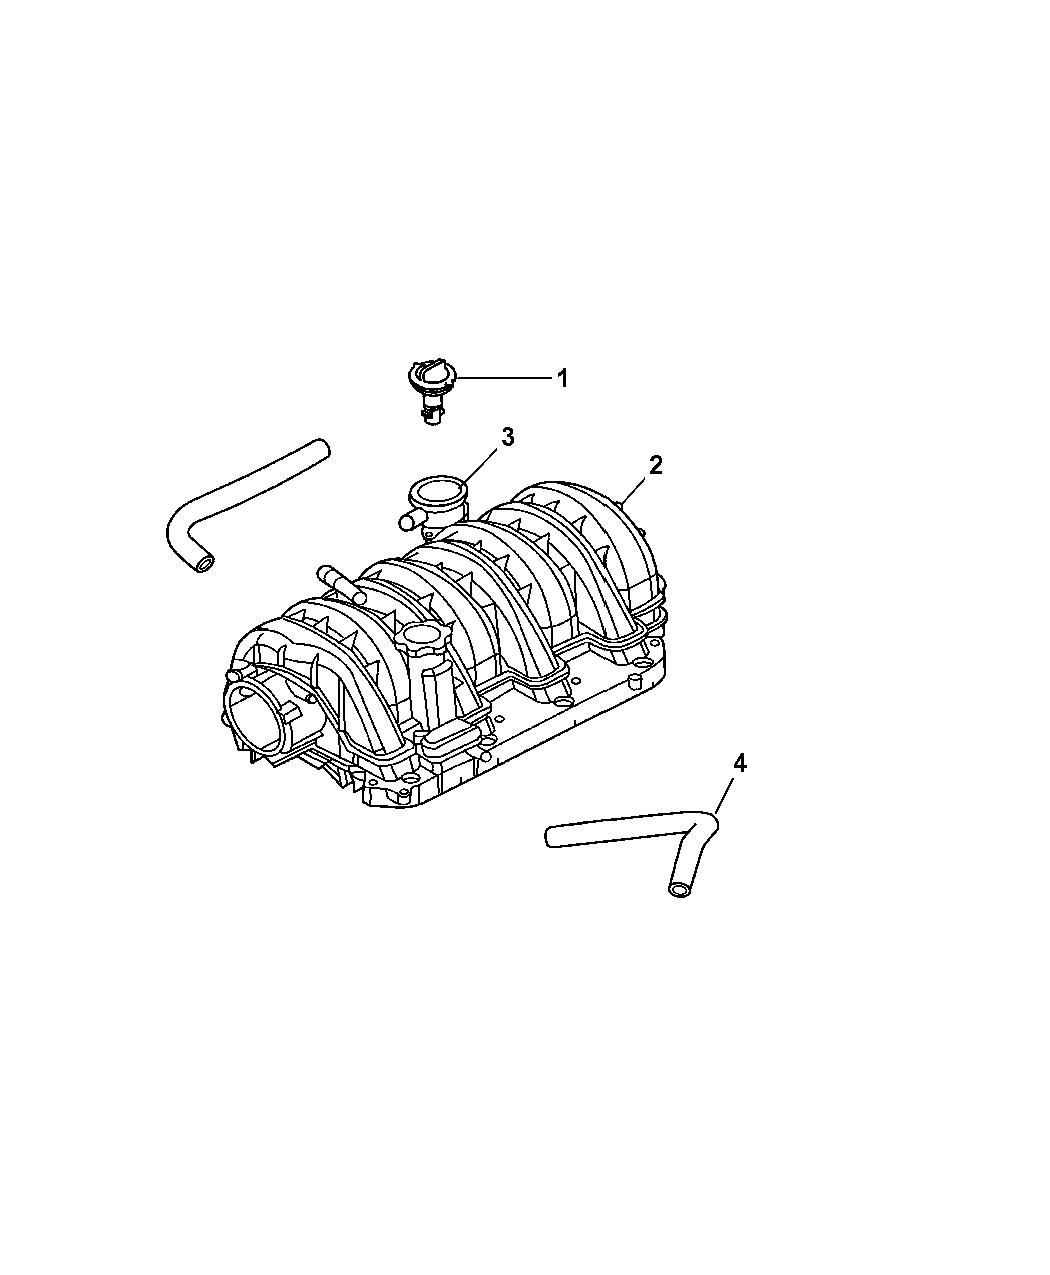 2006 Jeep Commander Crankcase Ventilation Mopar Parts Giant Fuel Filter Thumbnail 1